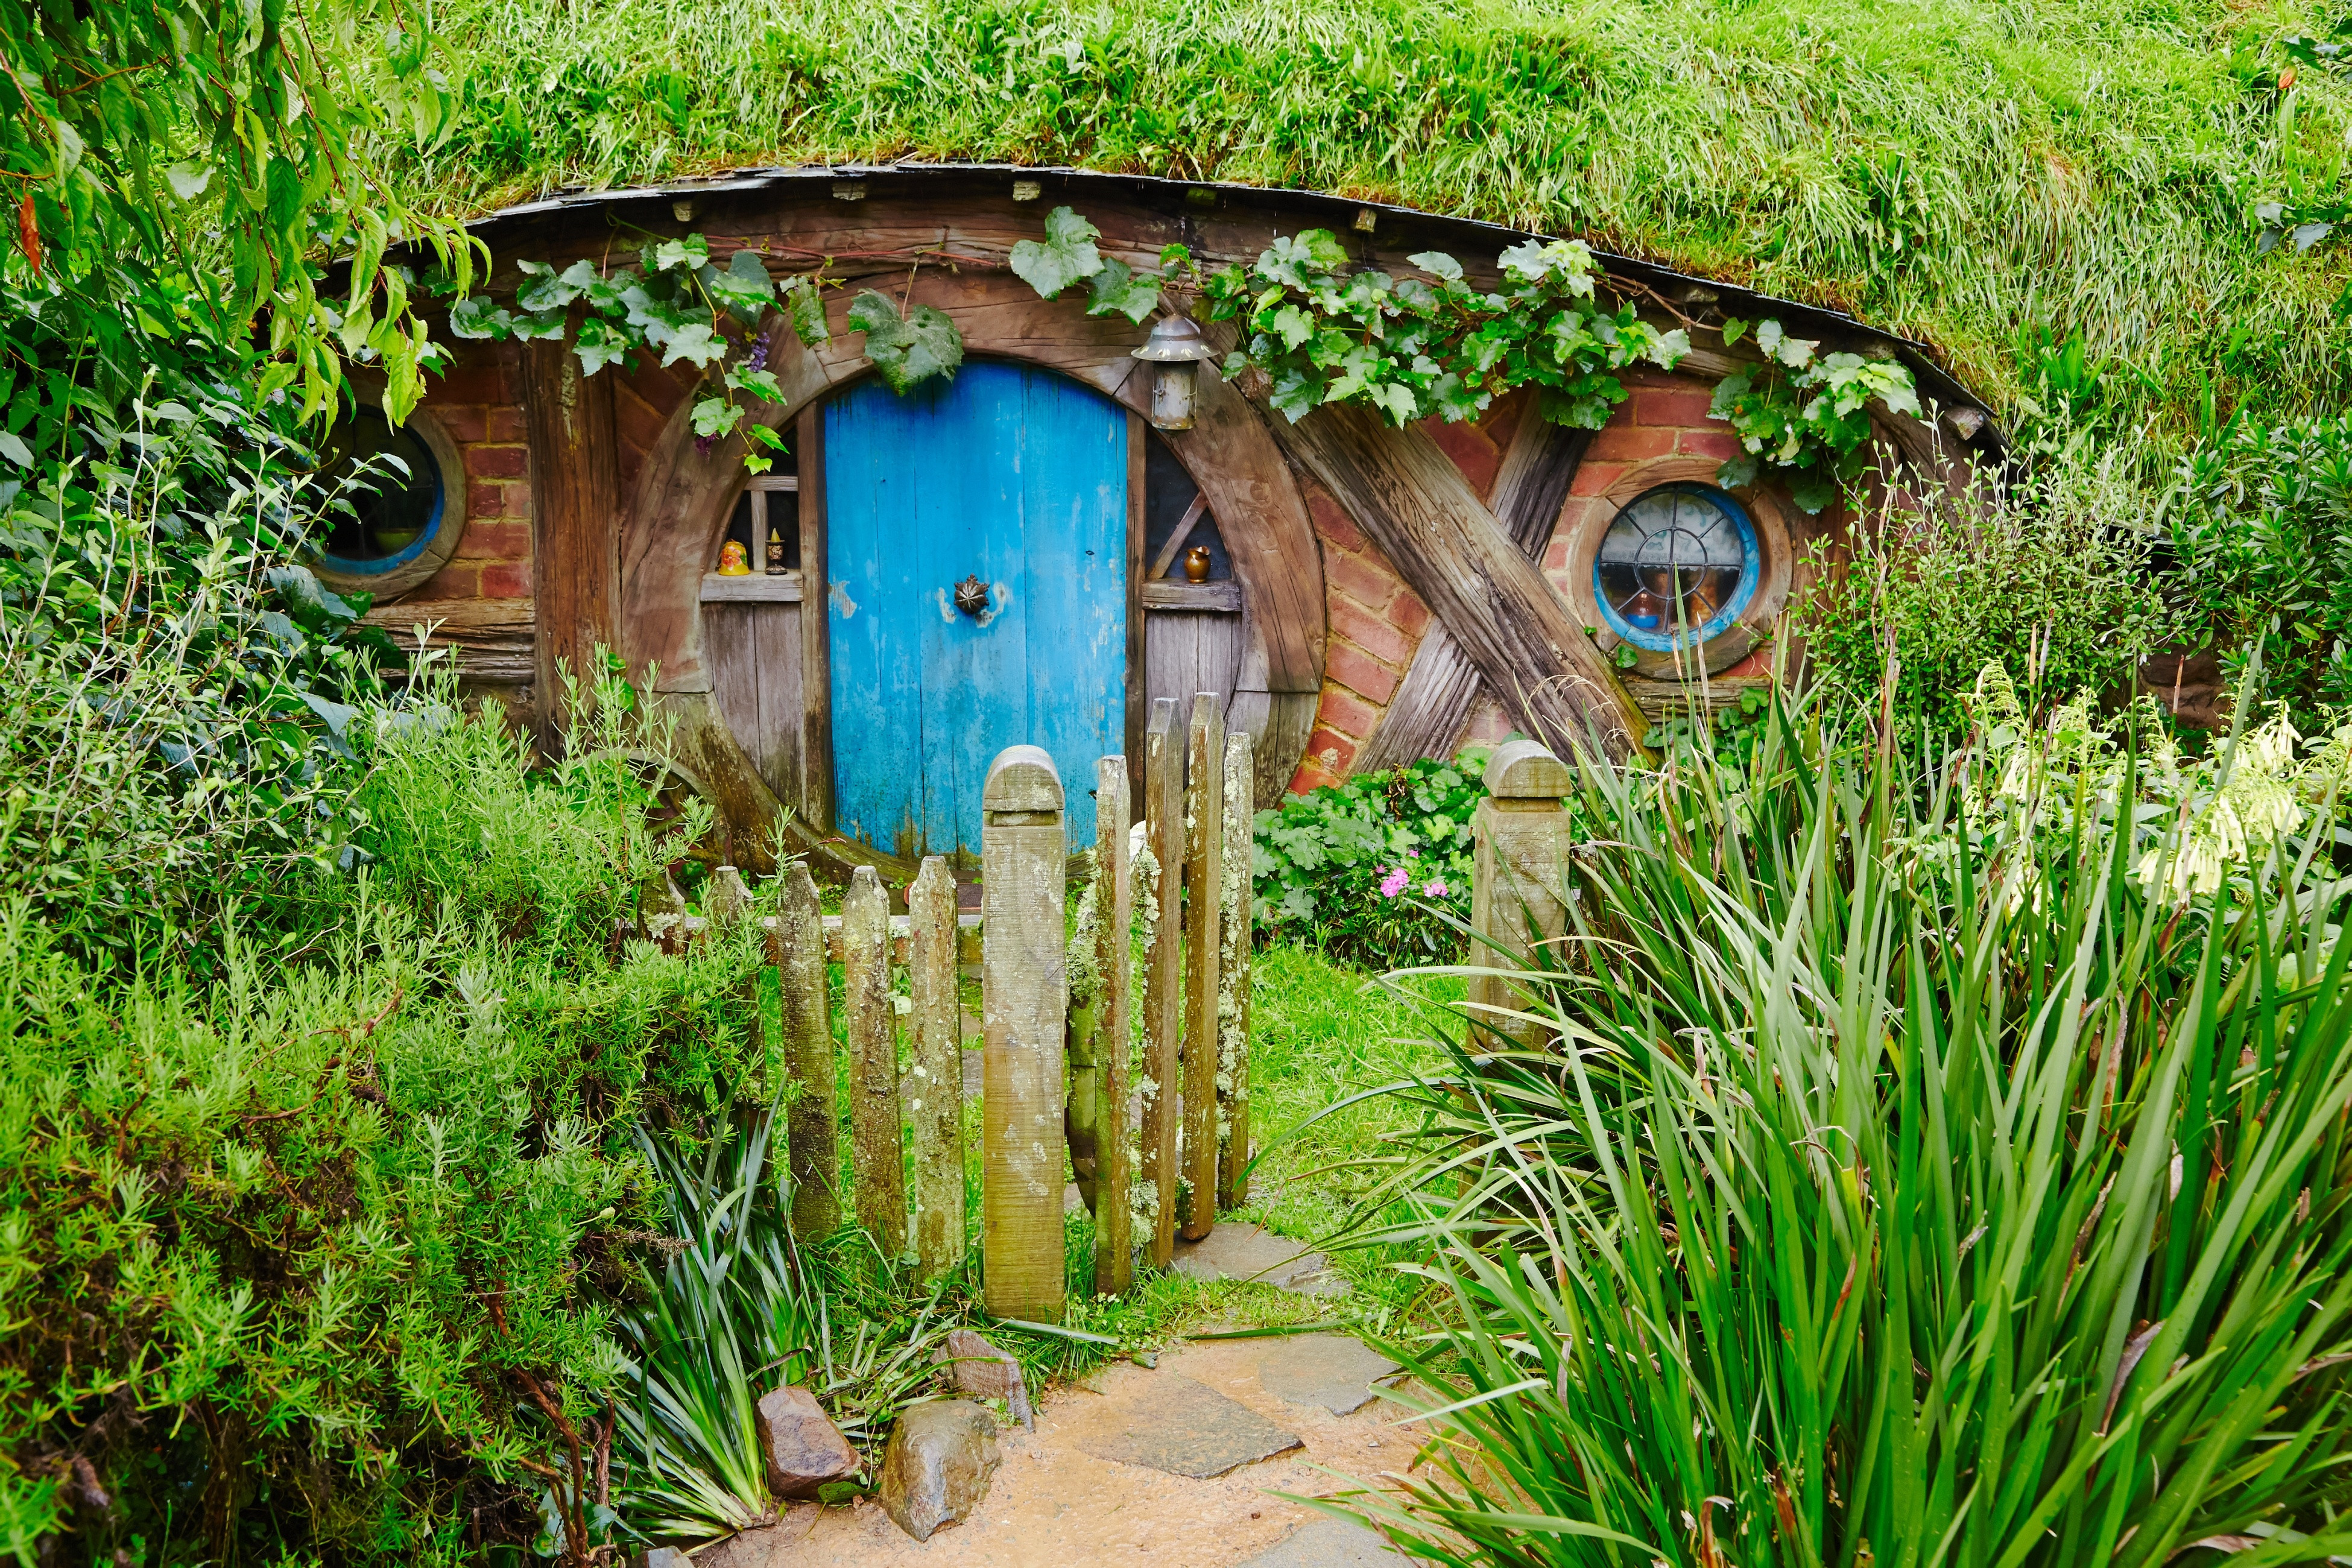 The Hobbit Tour of Hobbiton